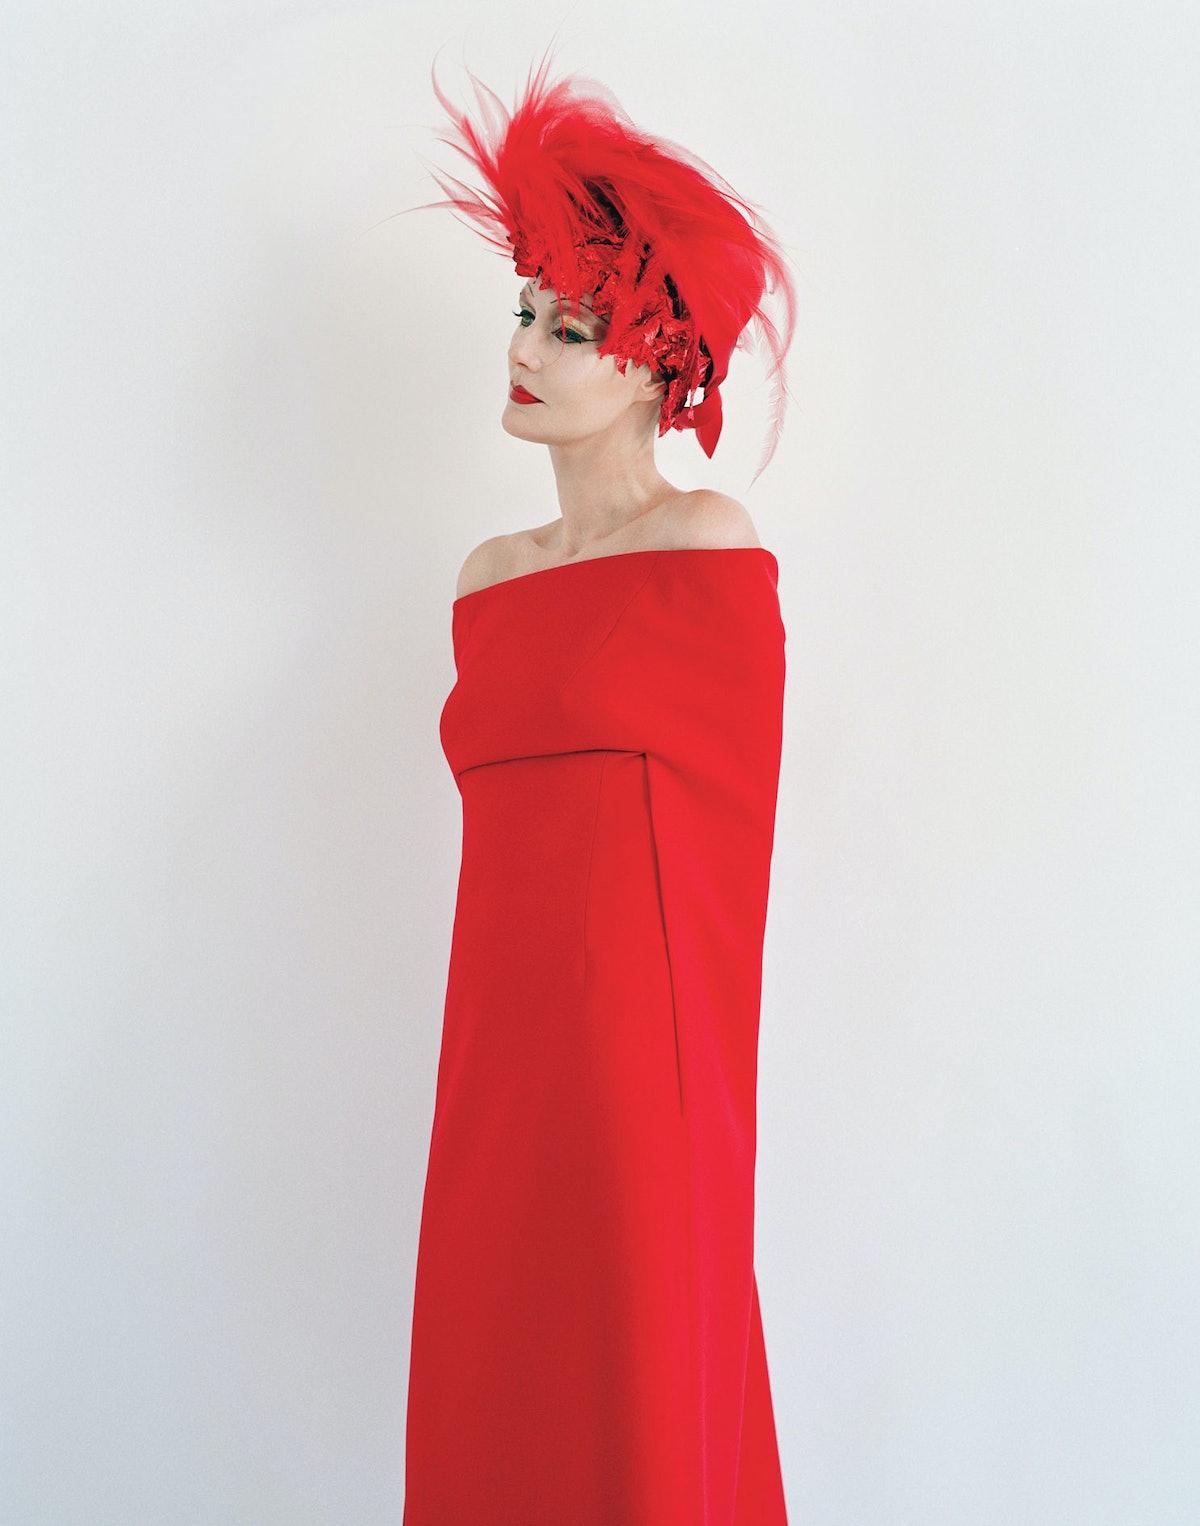 Photo by Tim Walker, styled by Edward Enninful; W Magazine April 2013